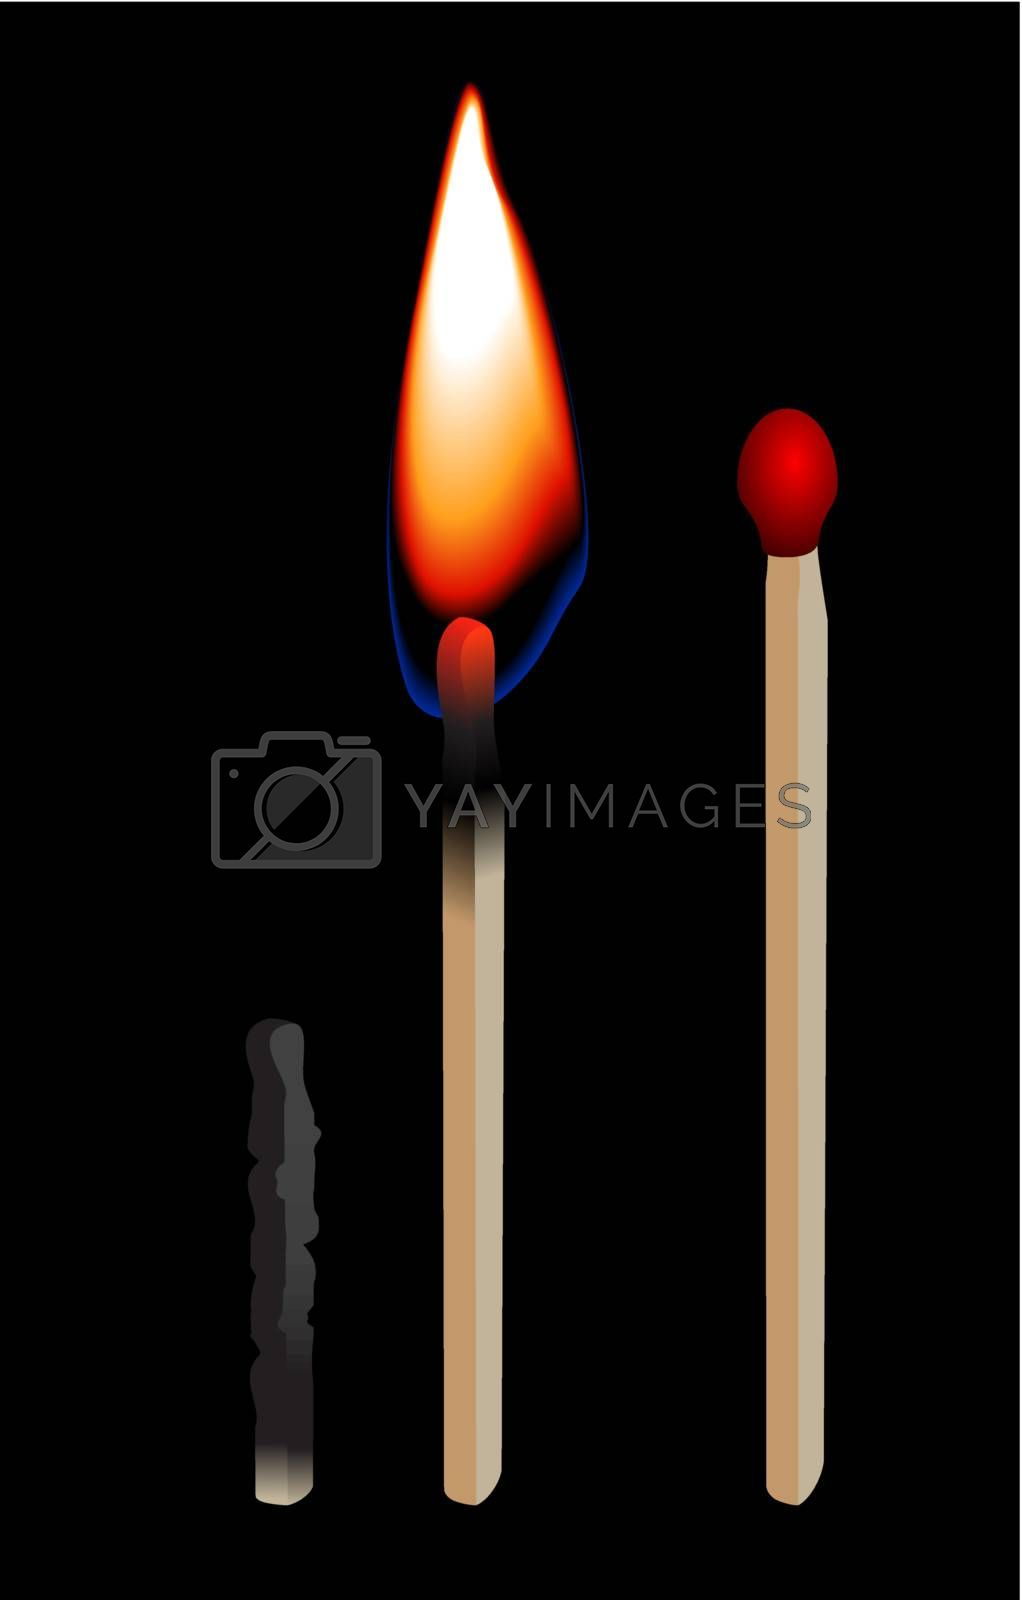 Burning matchstick by jfcalheiros